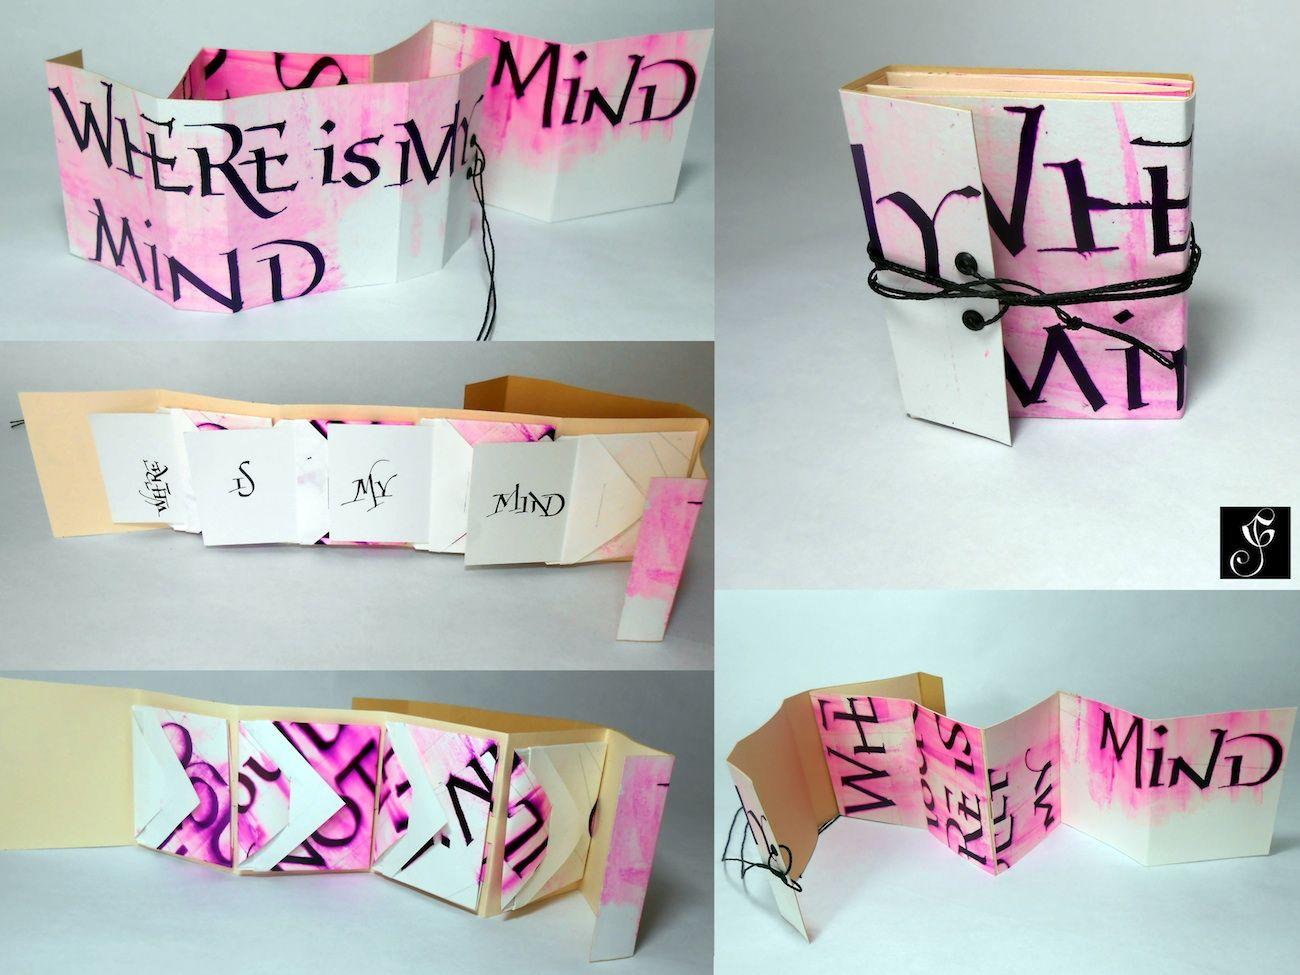 """Where is my mind"" 2014 Authors: Book project: Gabriela Irigoyen Calligraphy: Cláudio Gil 6,5 X 7,5 cm (closed) 39,5 X 7,5 cm (open)"